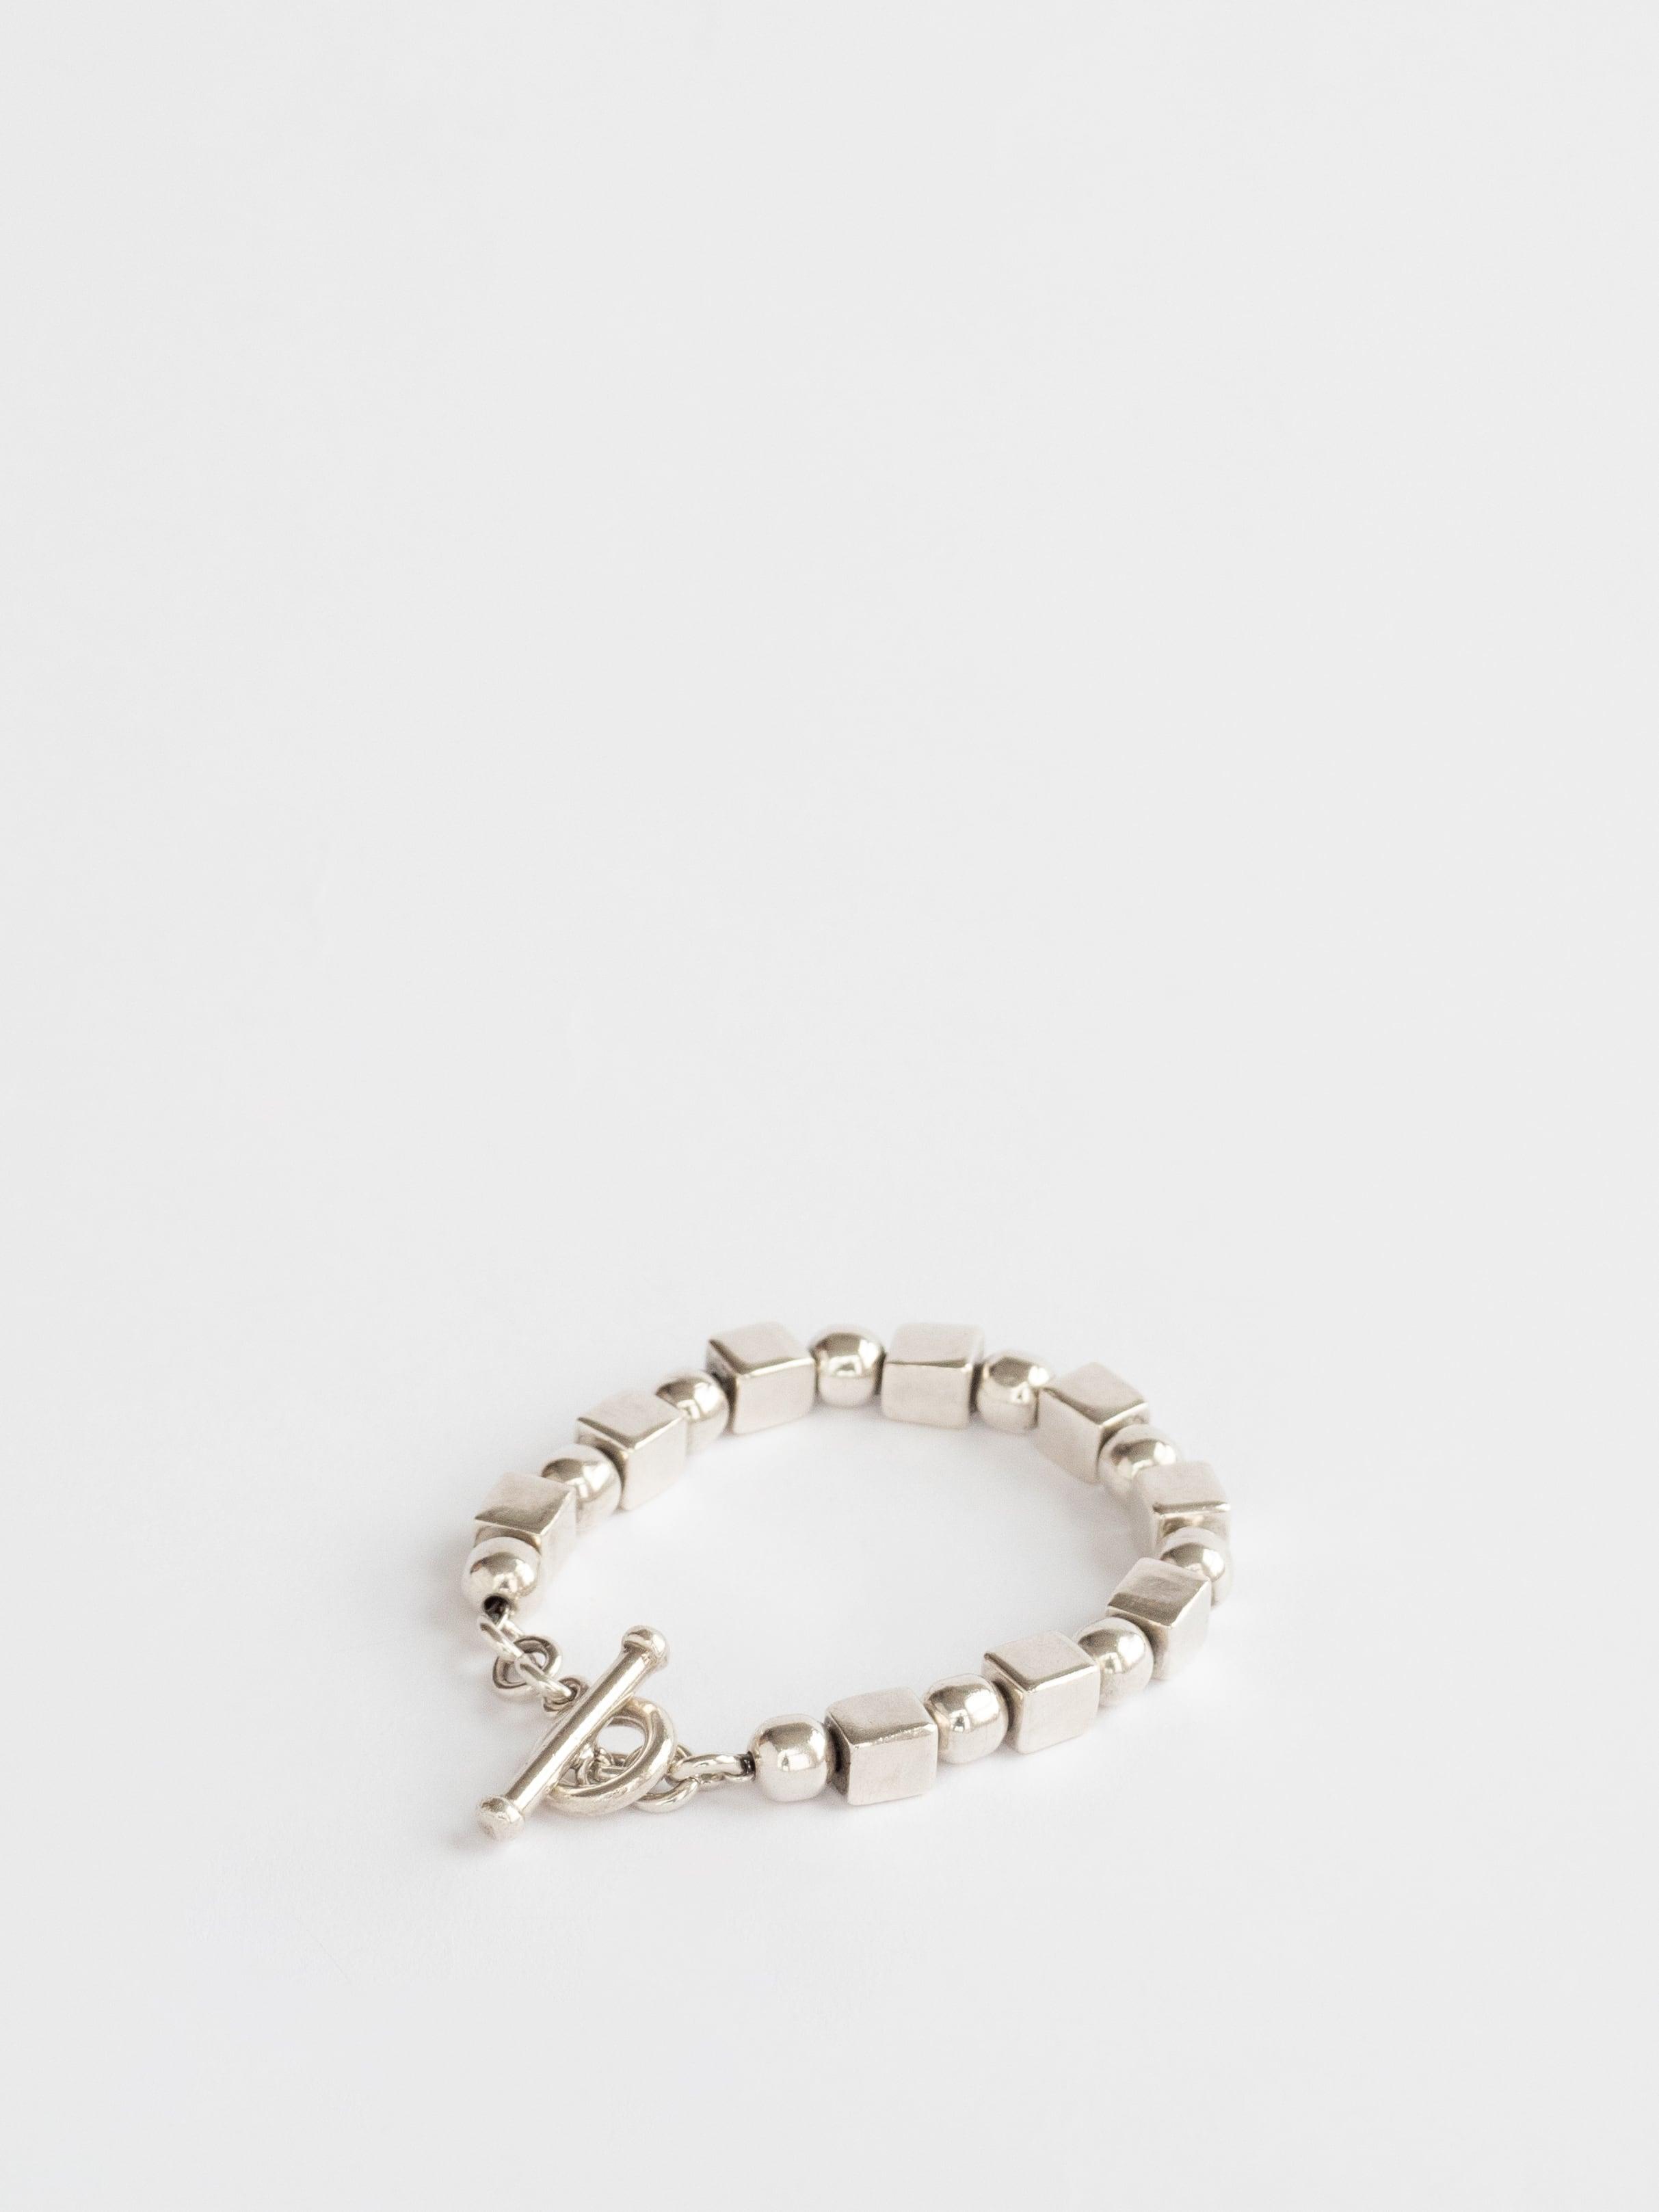 Beads Chain Bracelet / Mexico